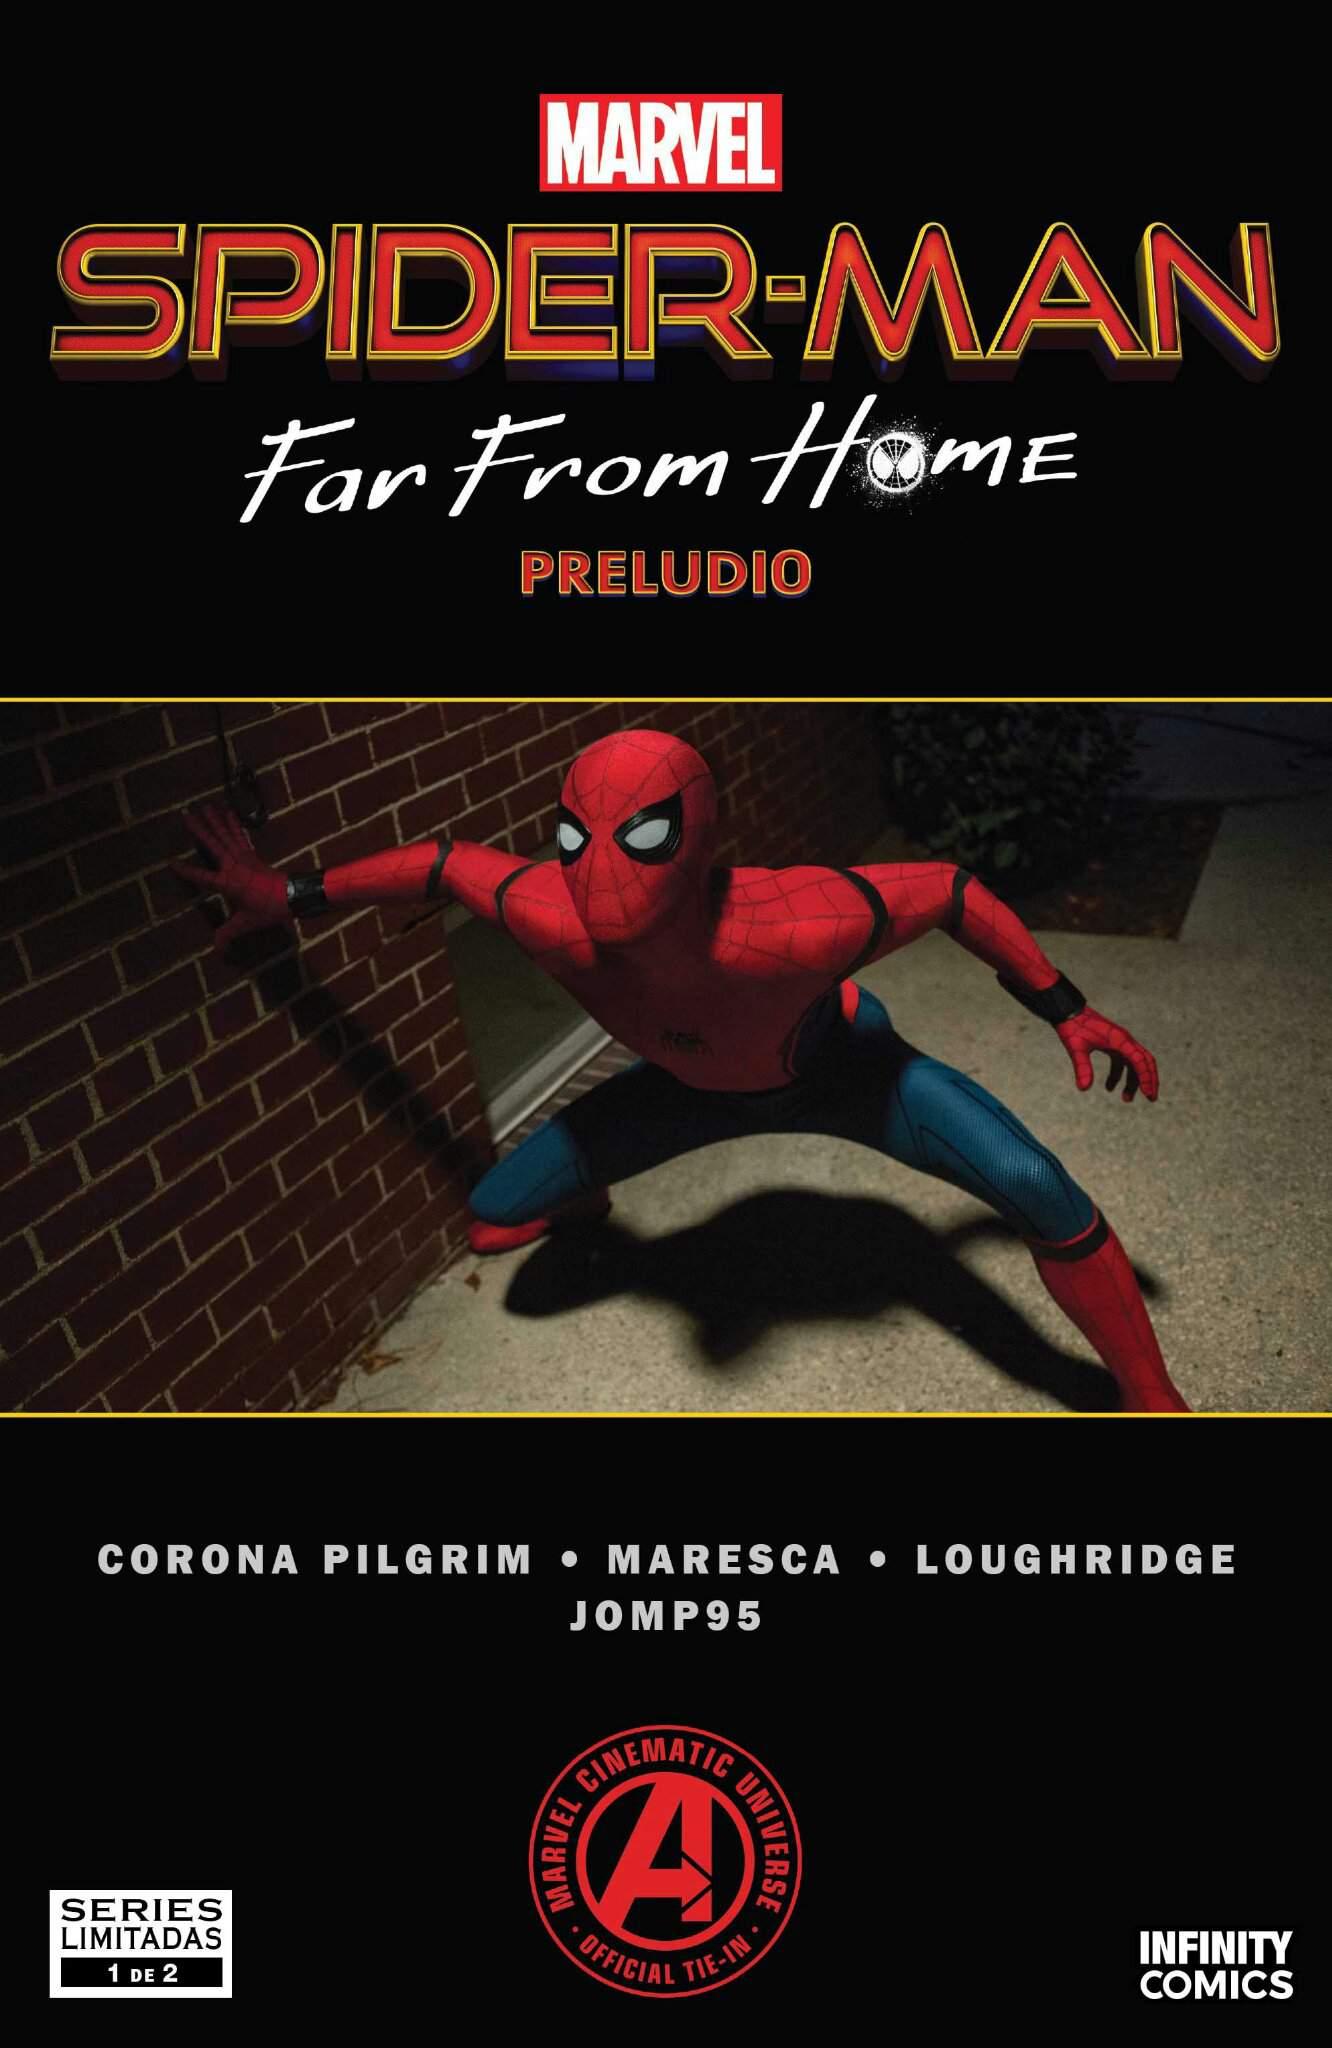 Spider Man Far From Home Wiki : spider, Spiderman, Preludio, Marvel, Amino